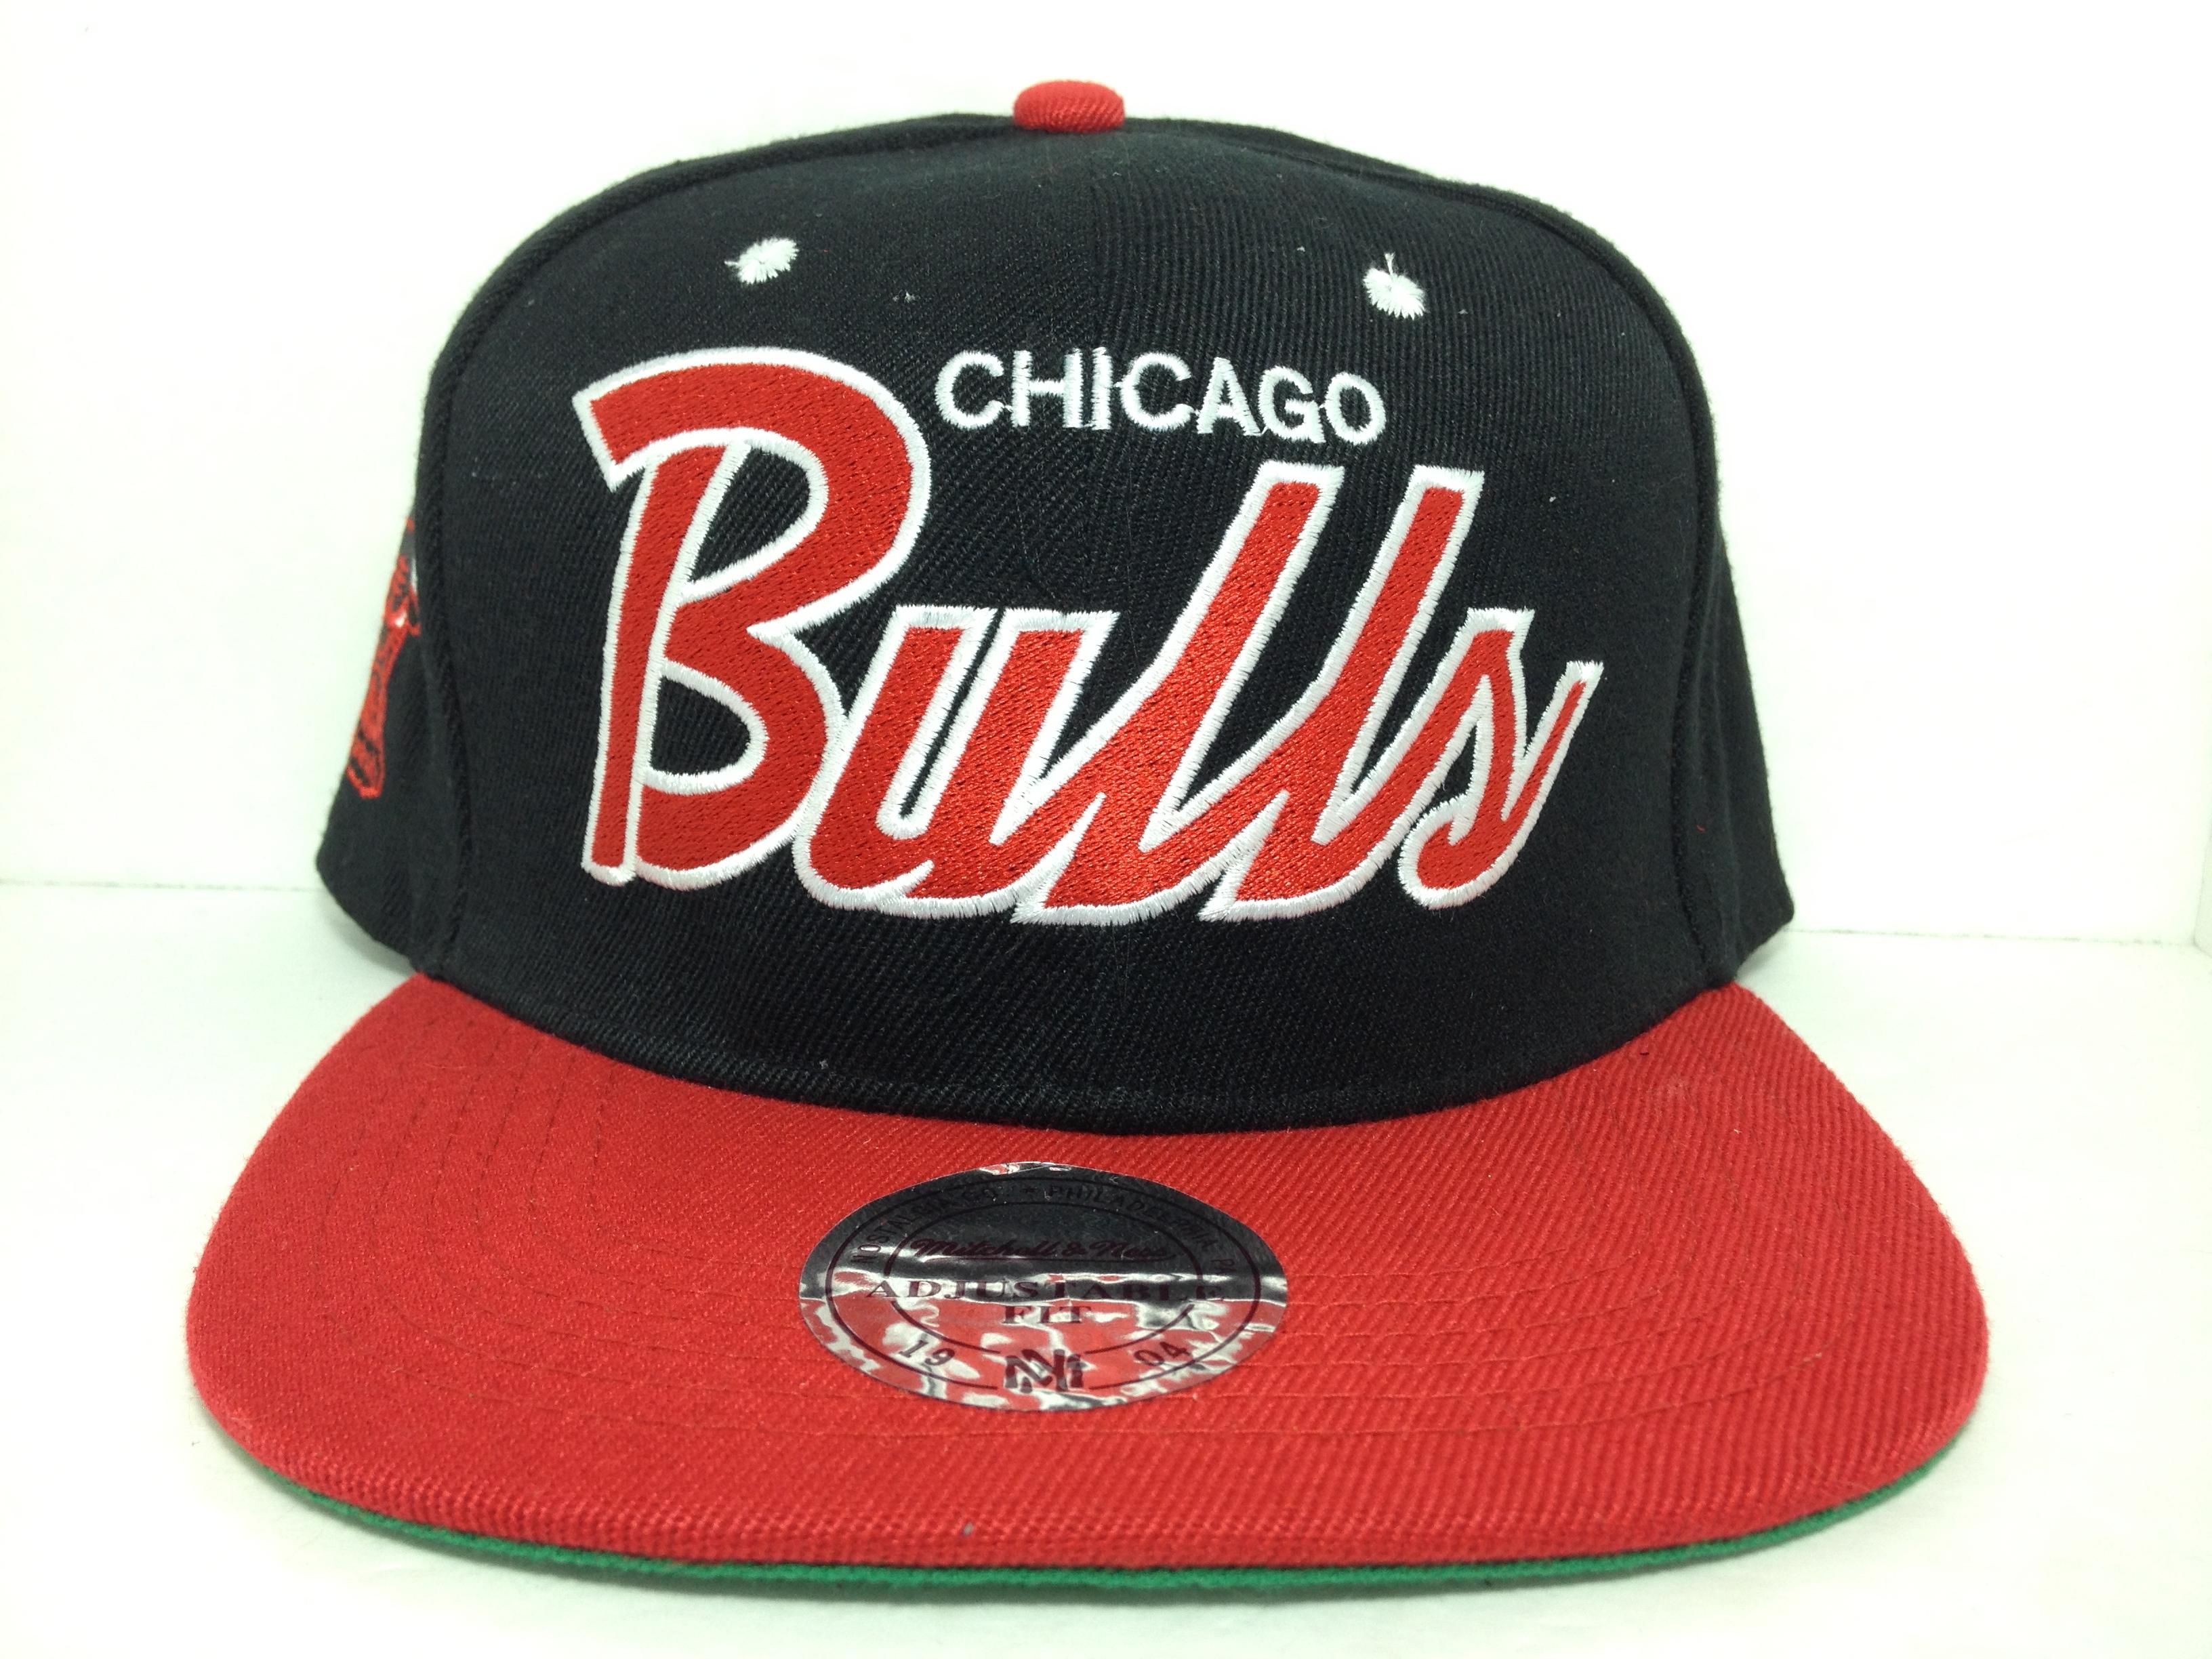 NBA Chicago Bulls Snapback · Tiger s Discount Store · Online Store ... d69b7bba084